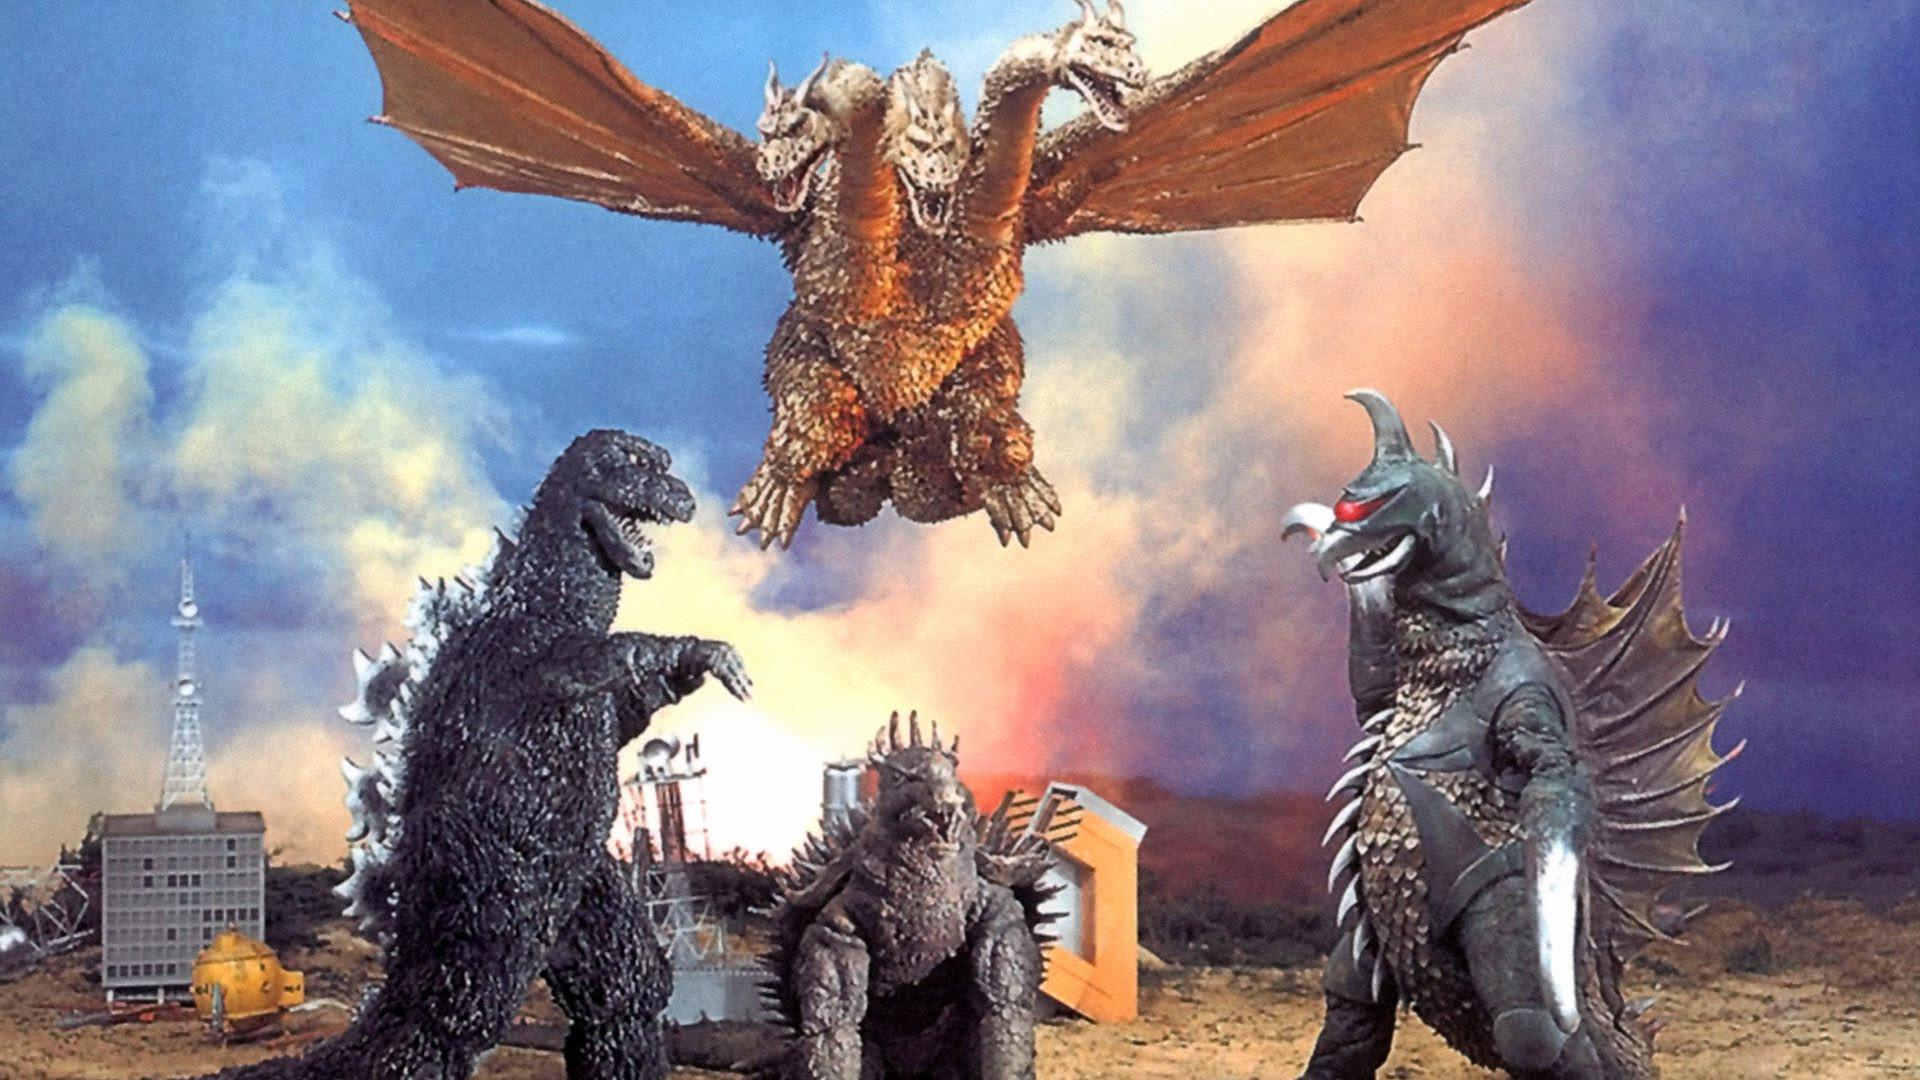 Res: 1920x1080, Godzilla Wallpaper Awesome Monster Movie Reviews Godzilla Vs Gigan Pt 2 Of 2